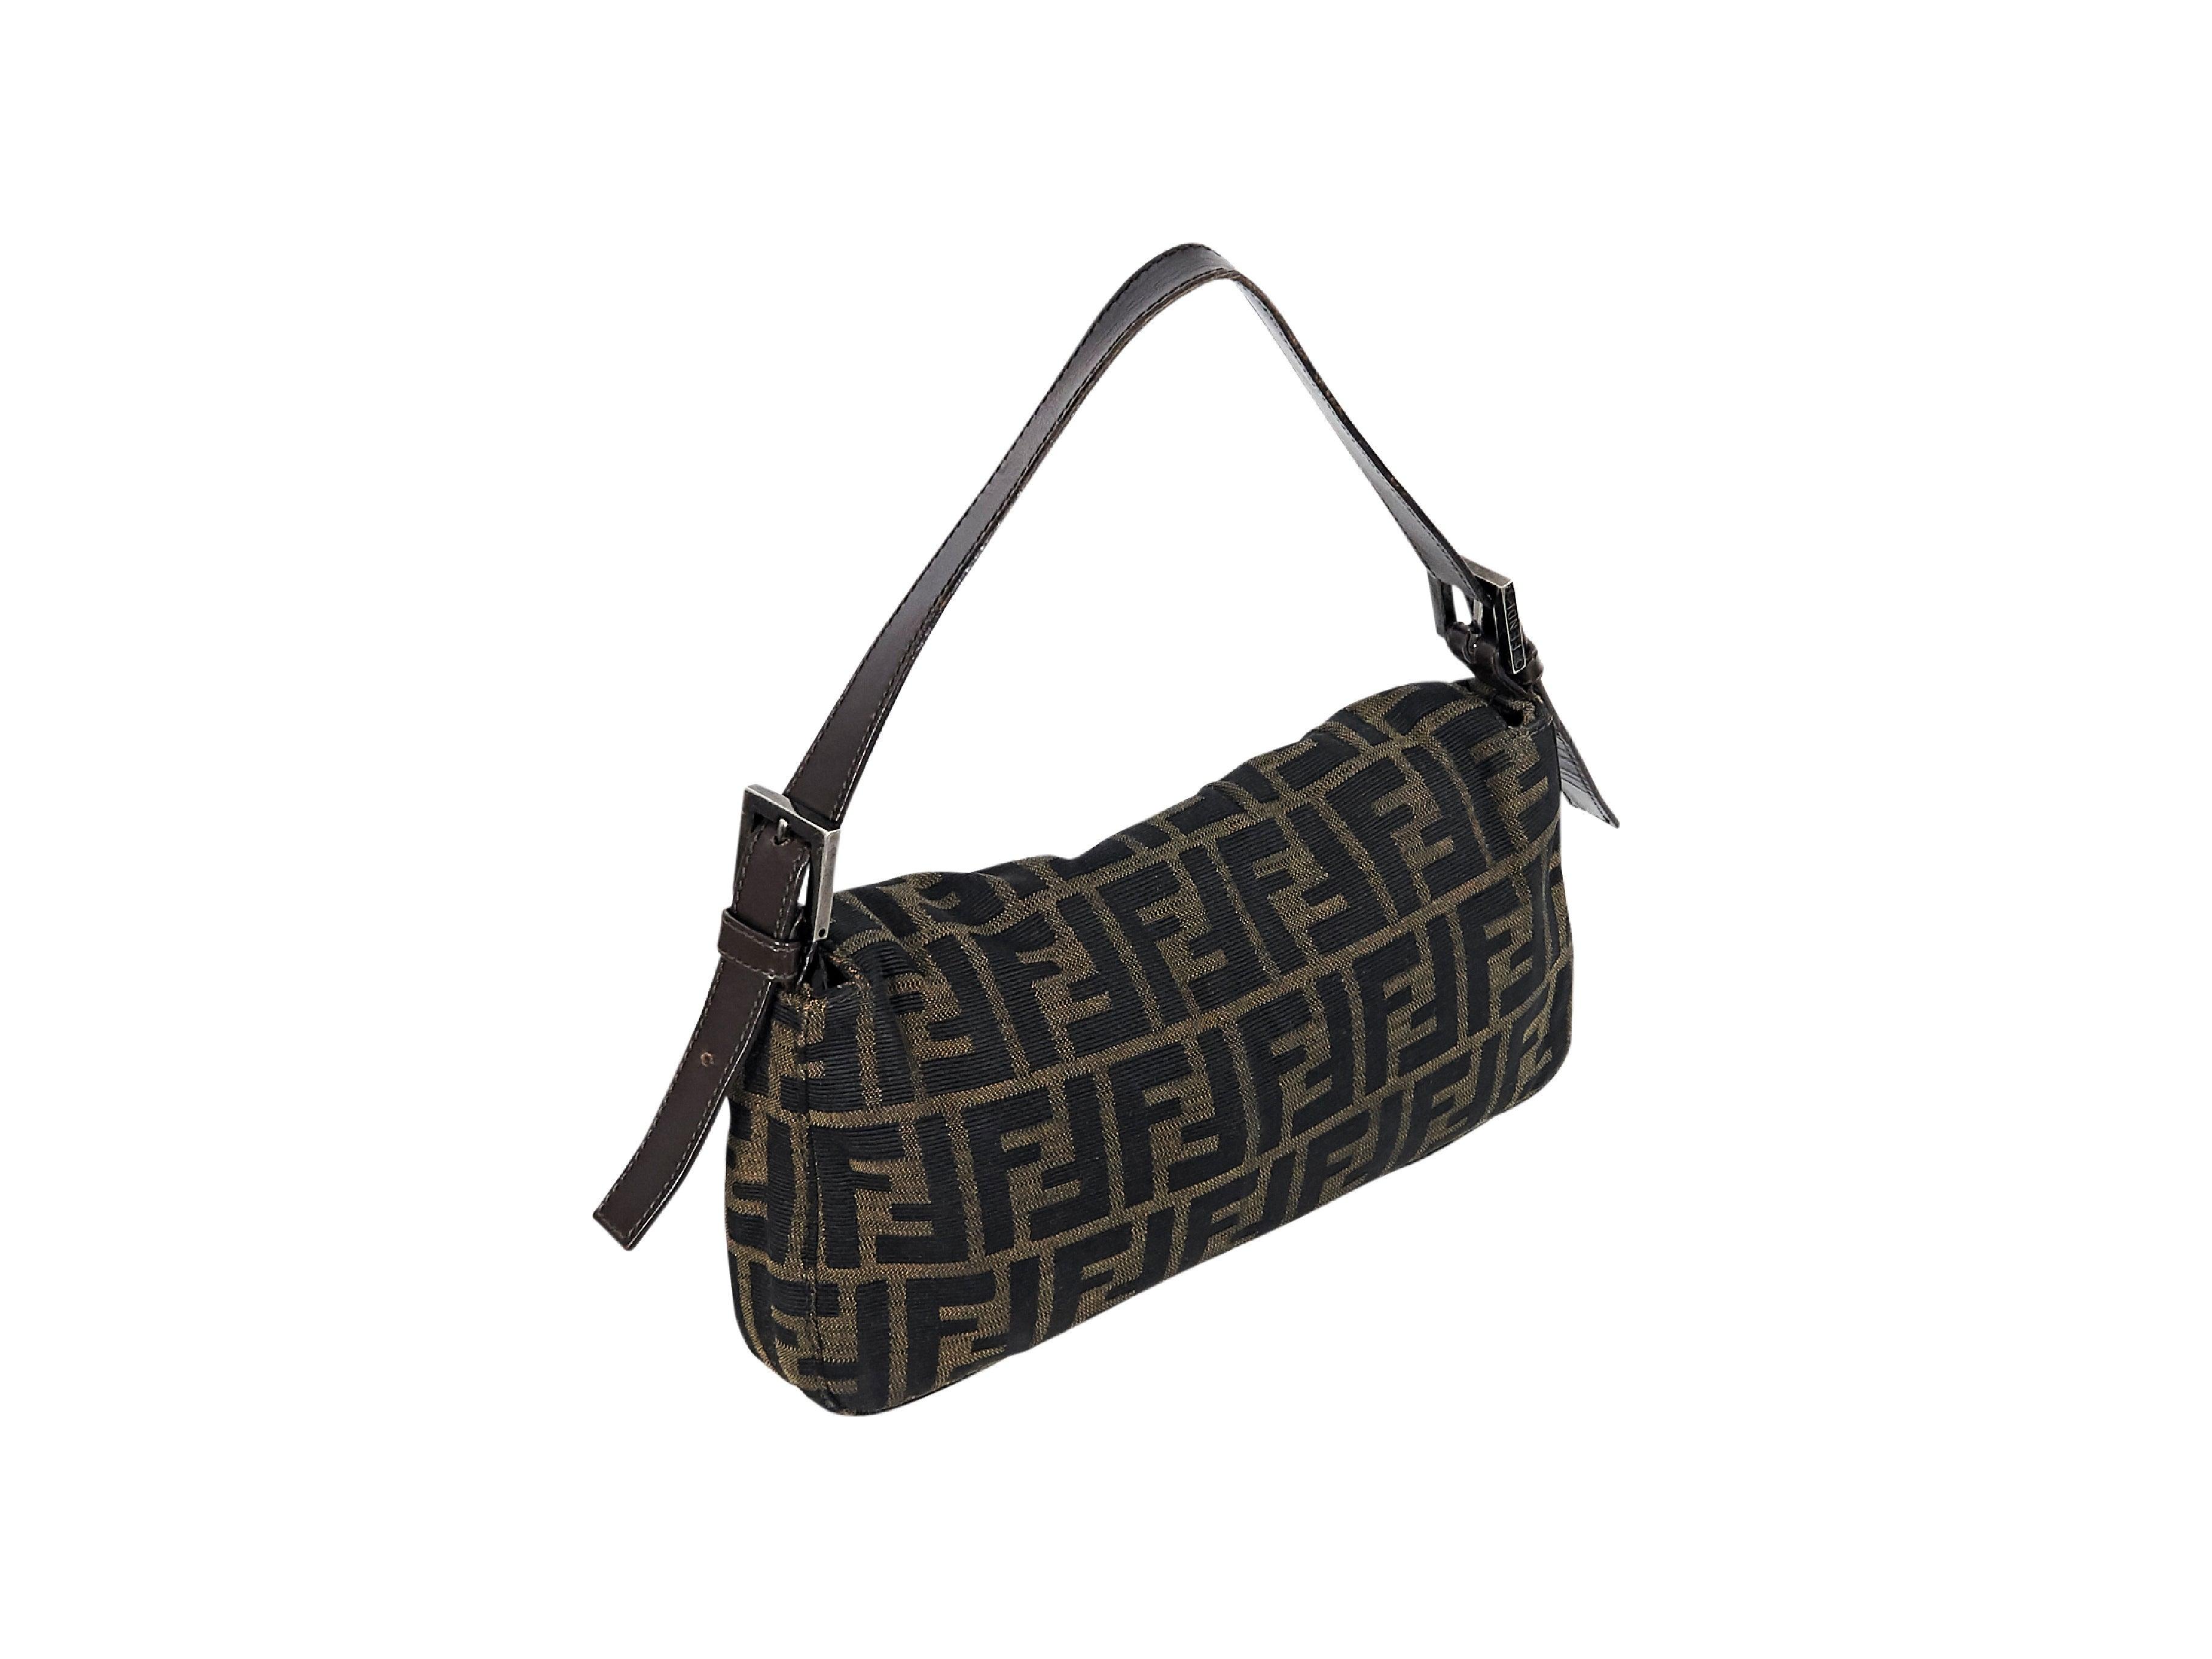 bb0dd40e038b Brown Fendi Monogram Zucca Shoulder Bag at 1stdibs